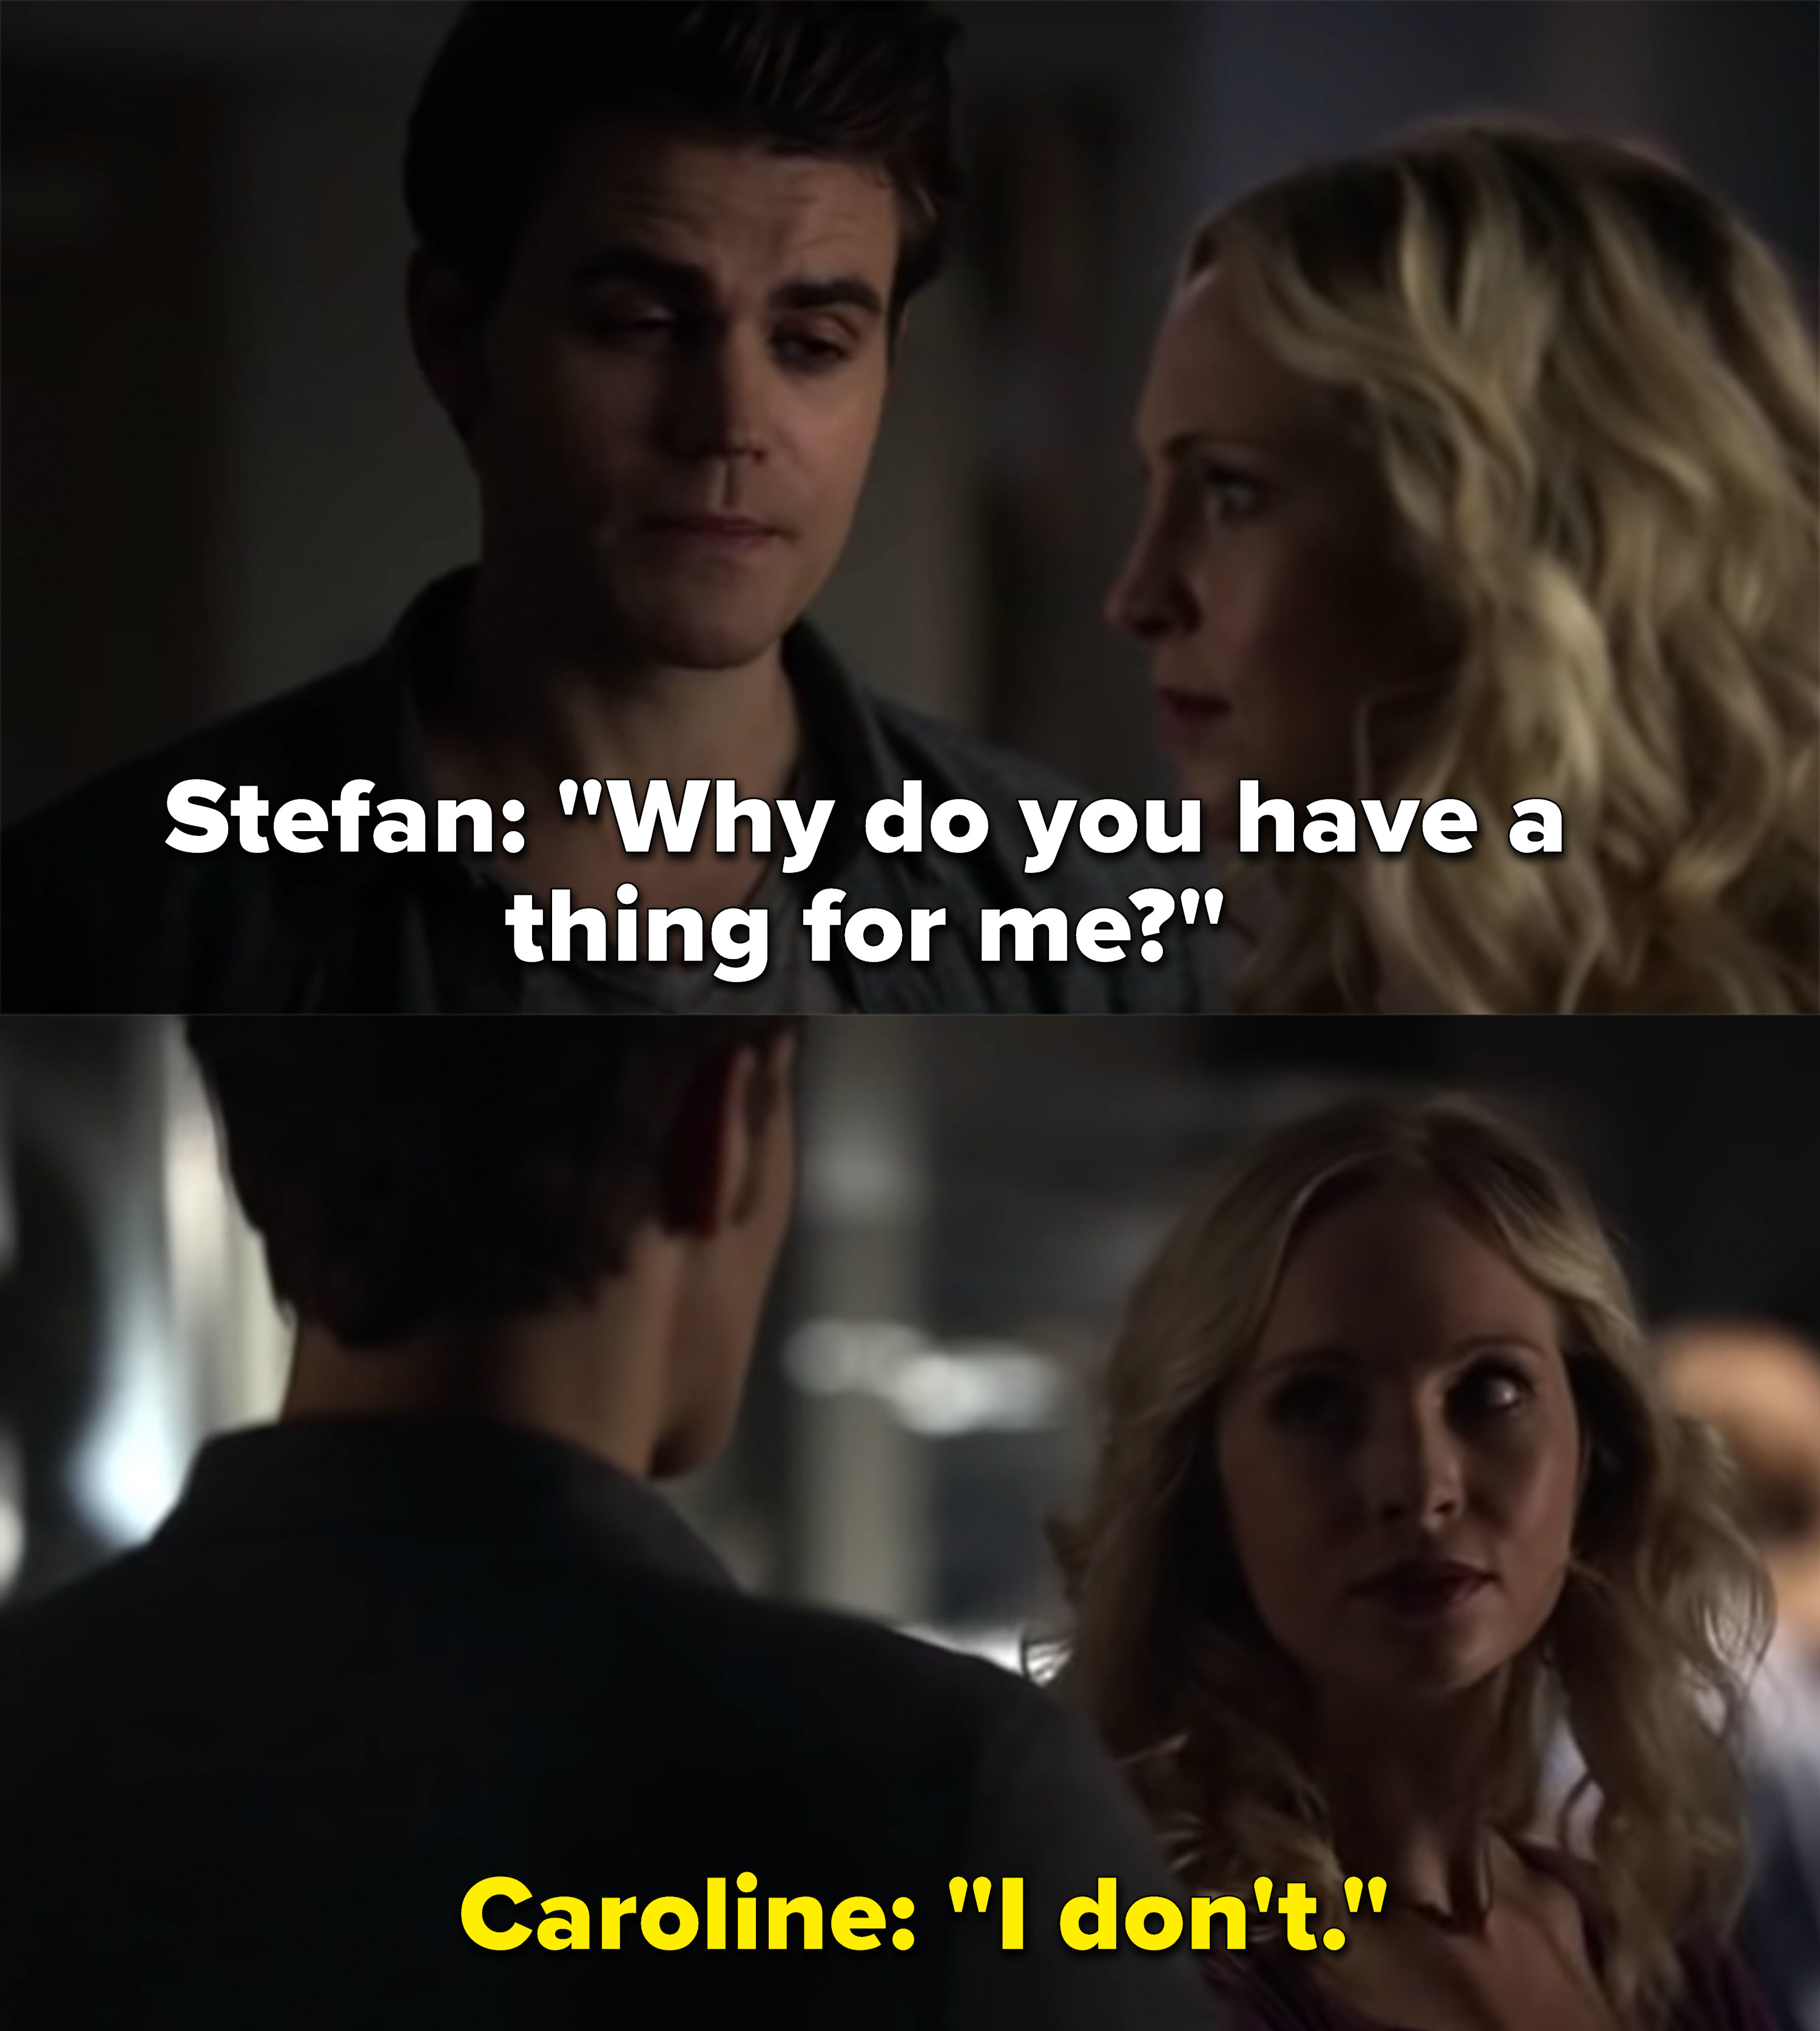 Stefan asks Caroline why she has a thing for him, Caroline denies it